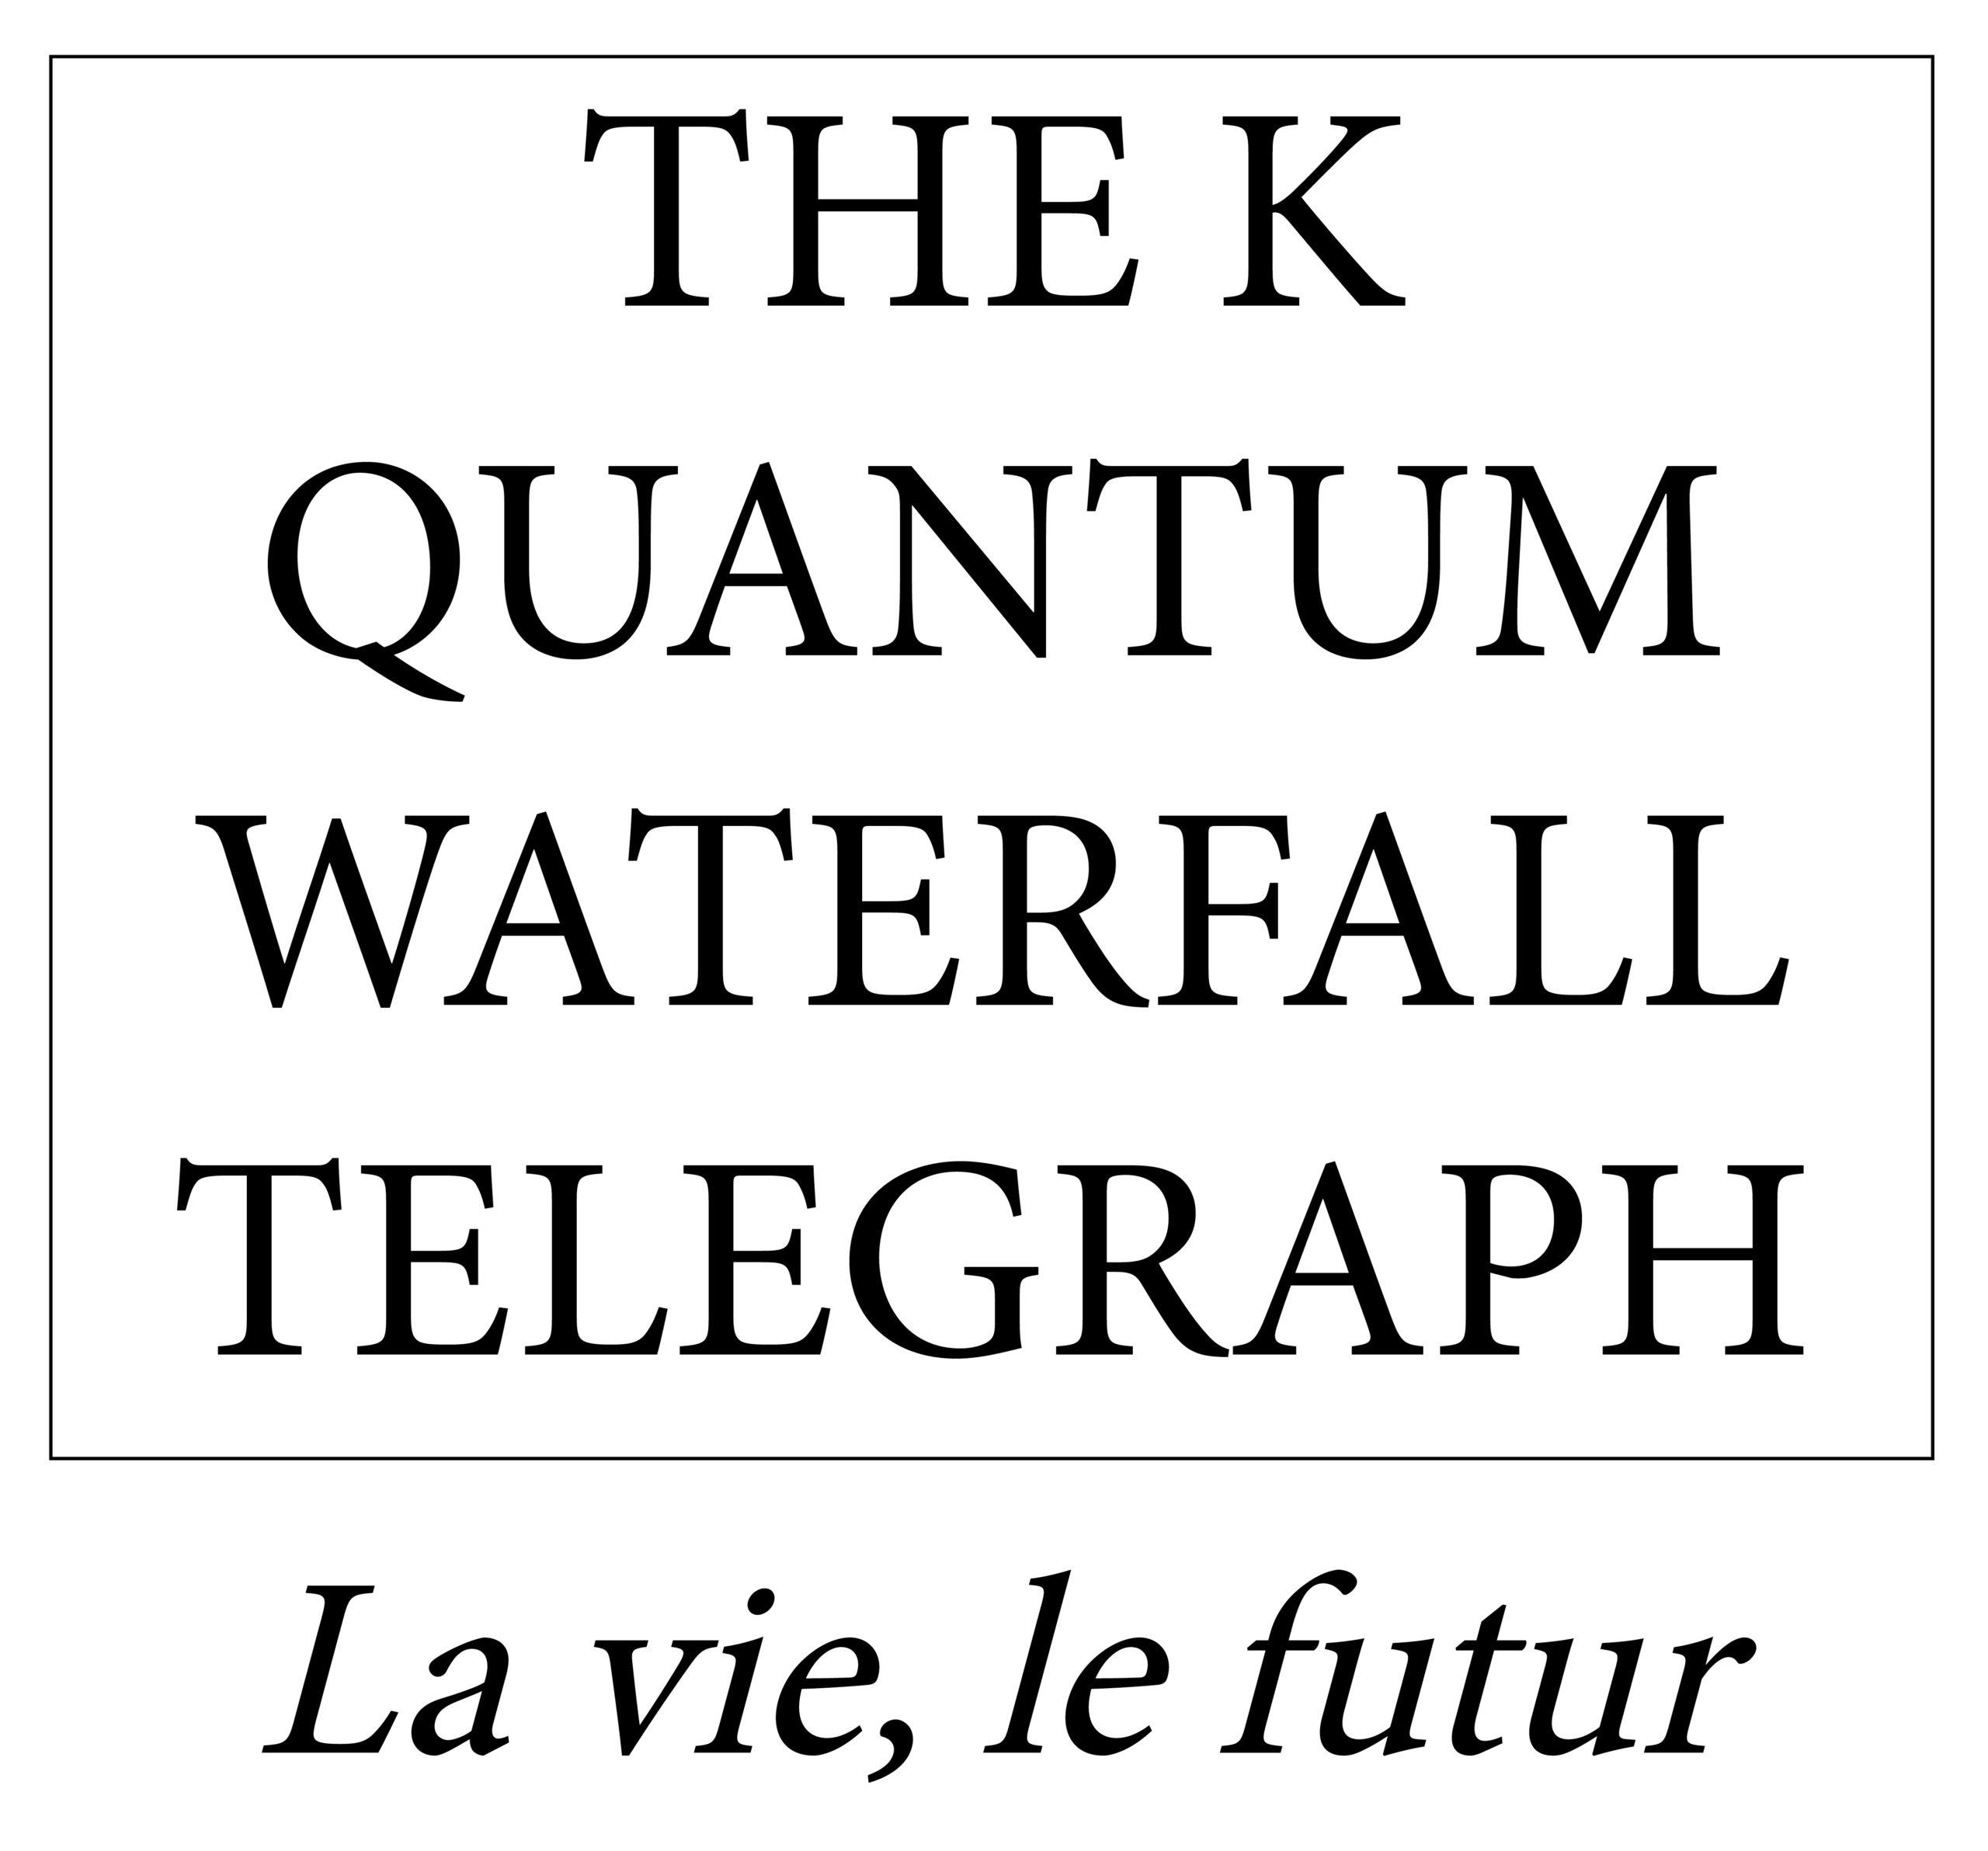 The K Quantum Waterfall Telegraph